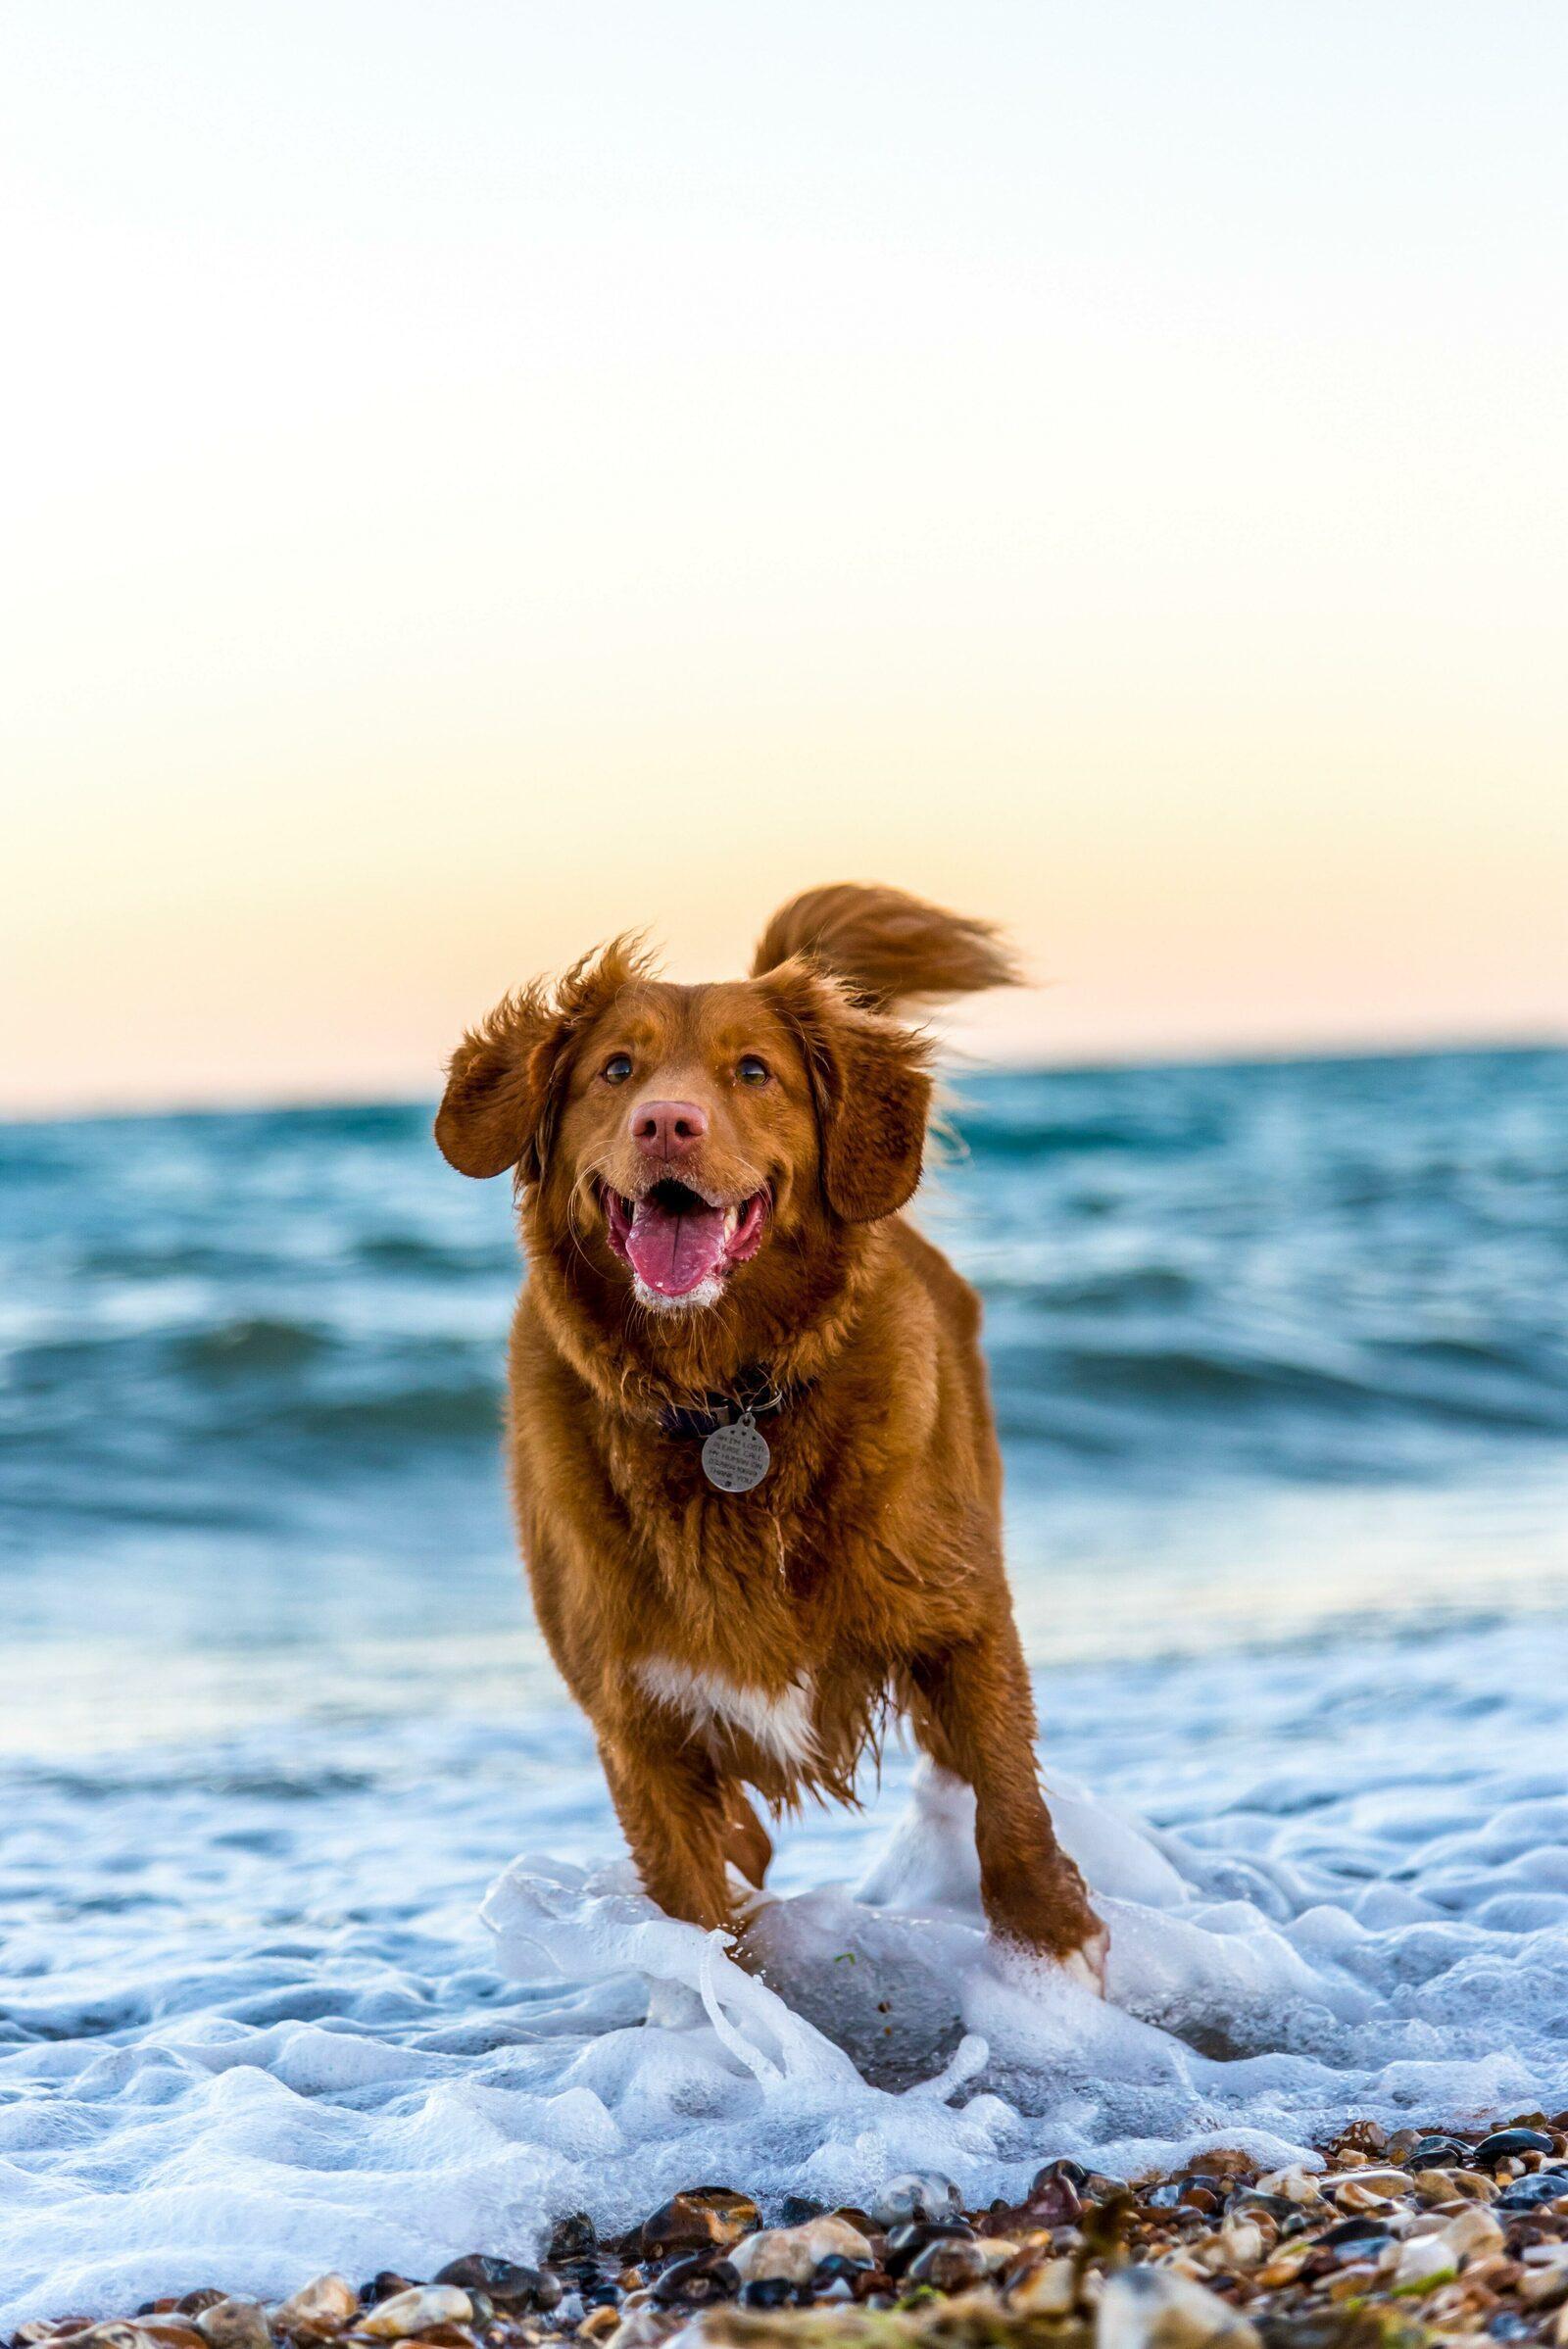 Chien sur la plage en vacances